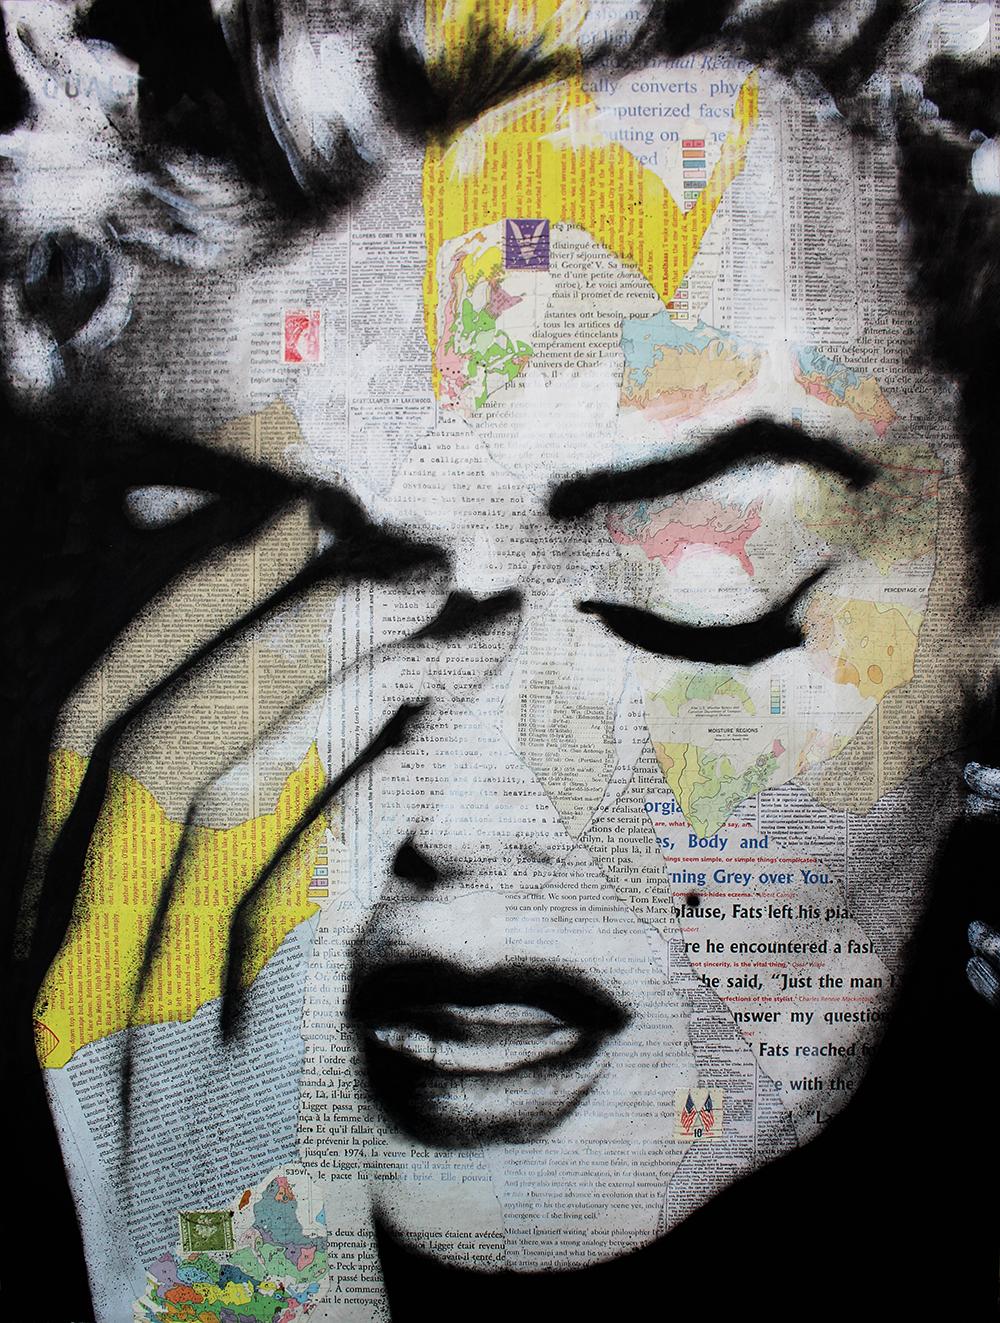 Marilyn-yellow